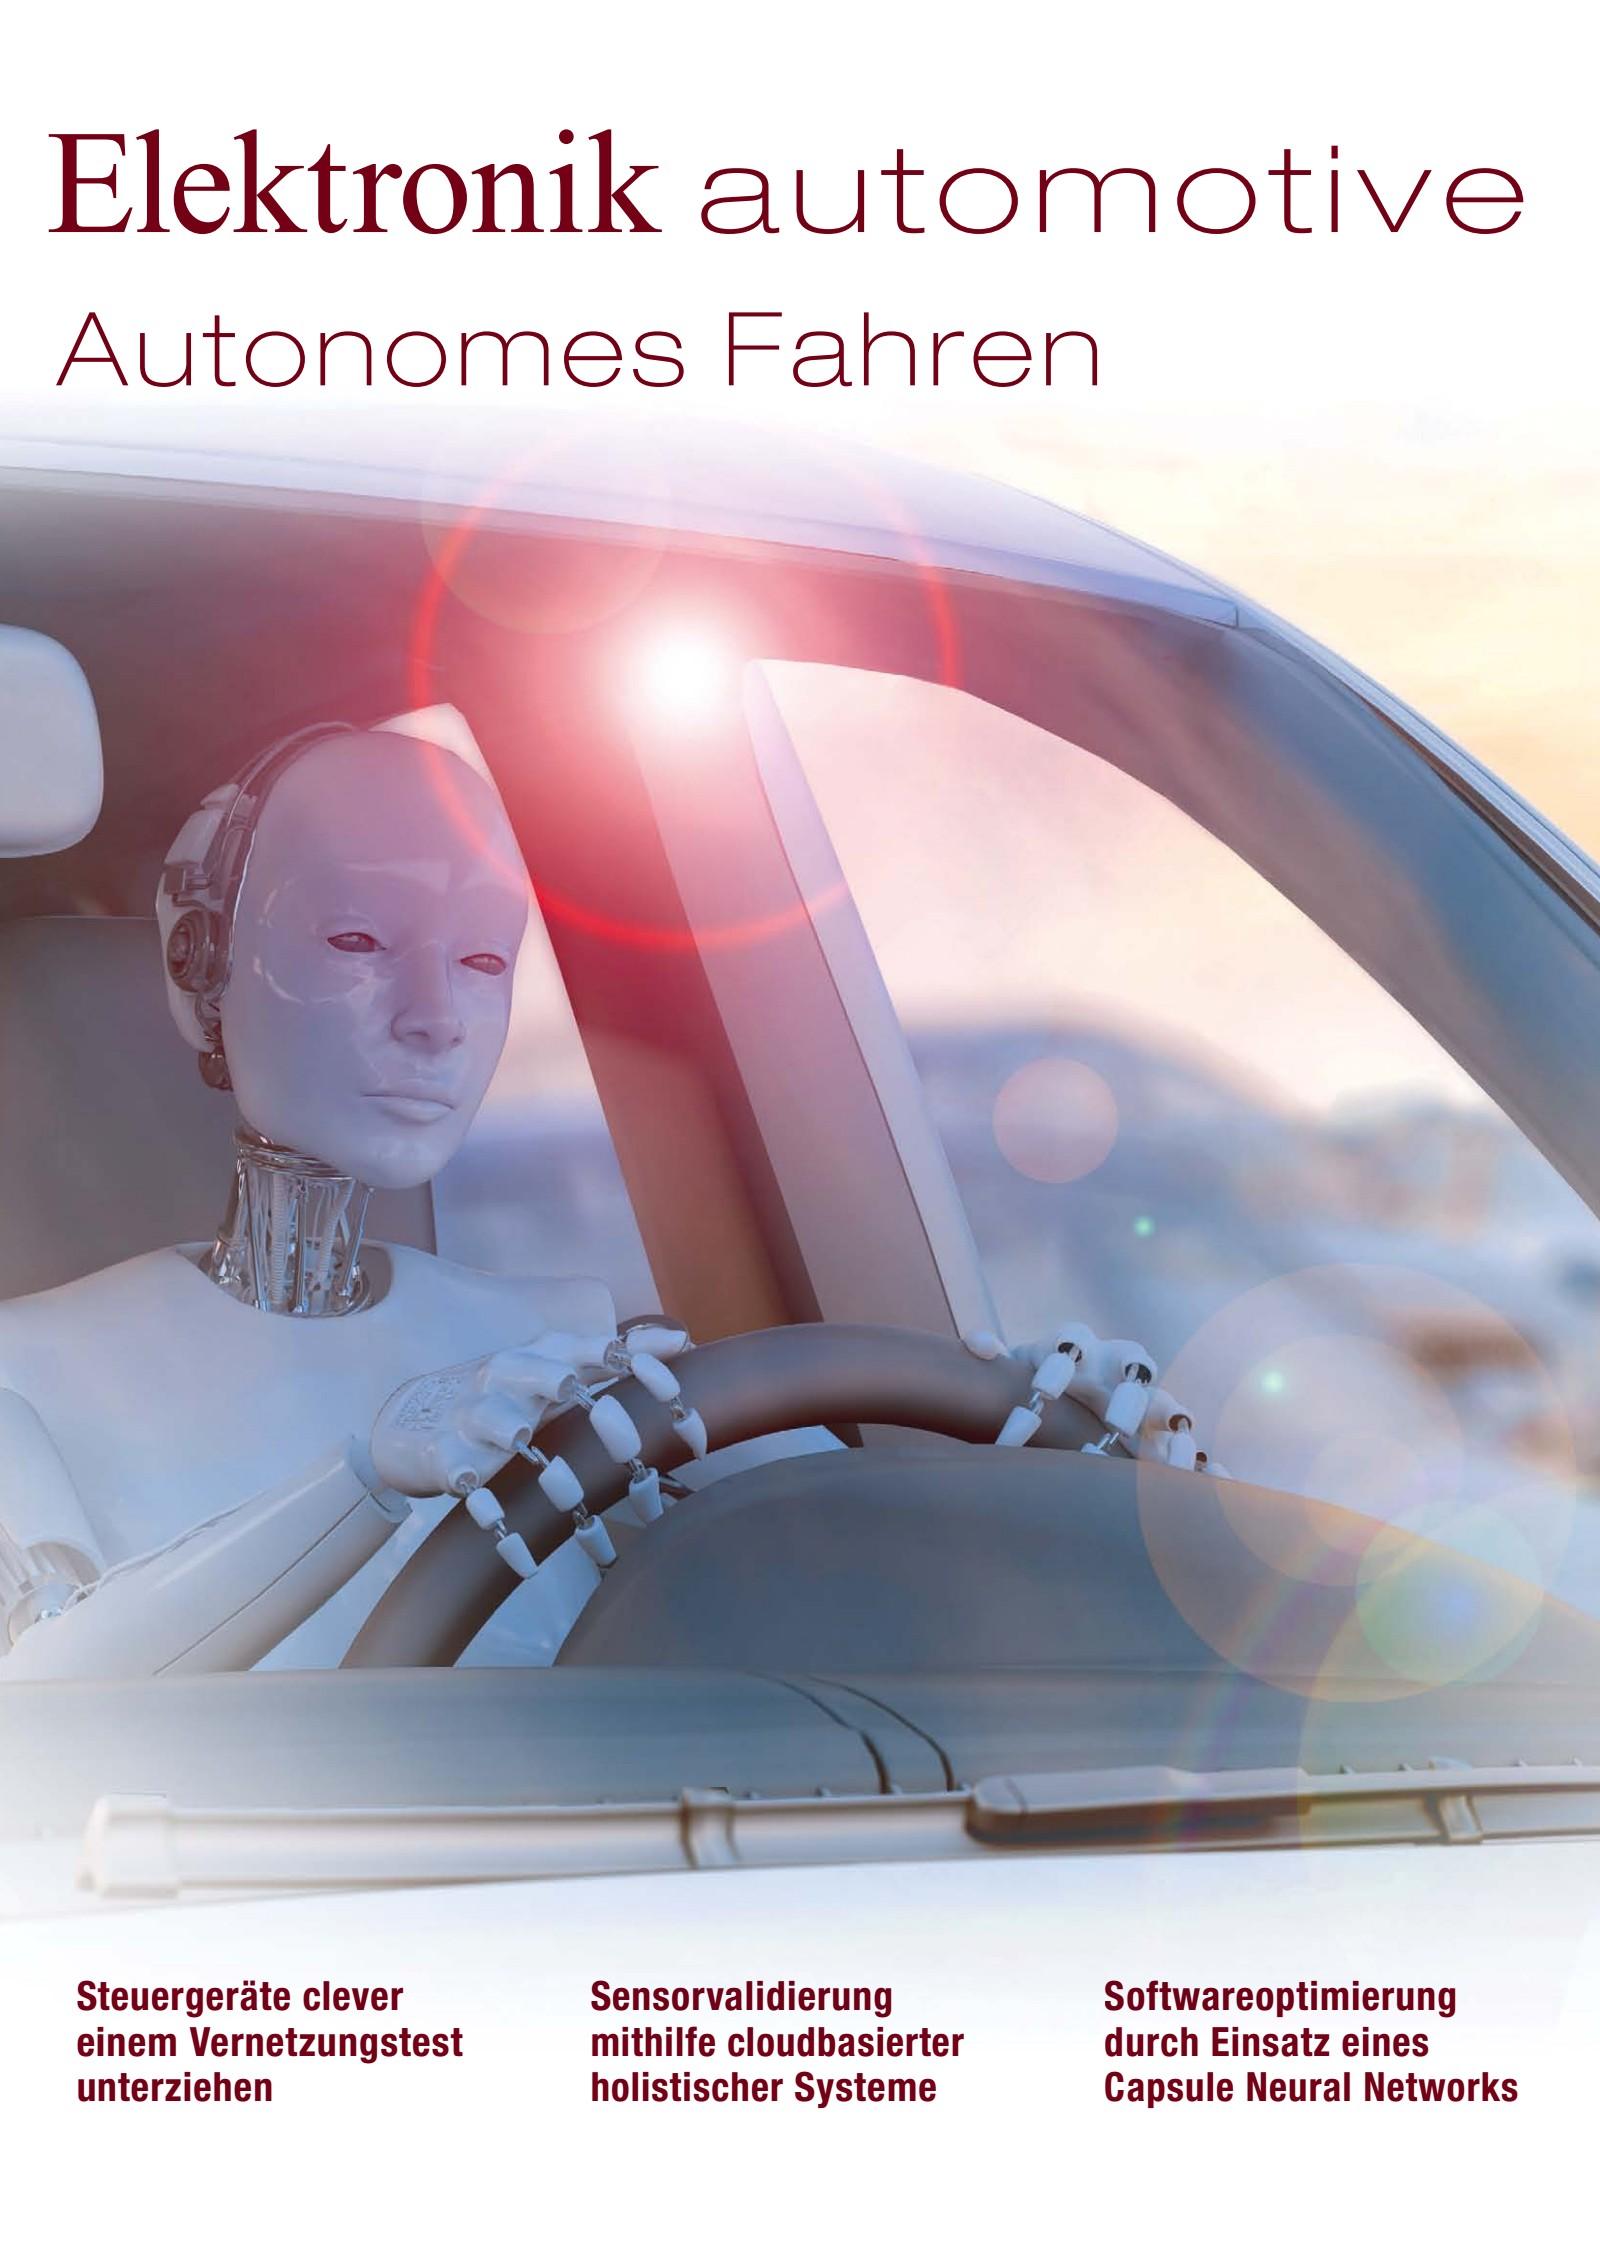 Elektronik automotive 07-08/2021 Digital